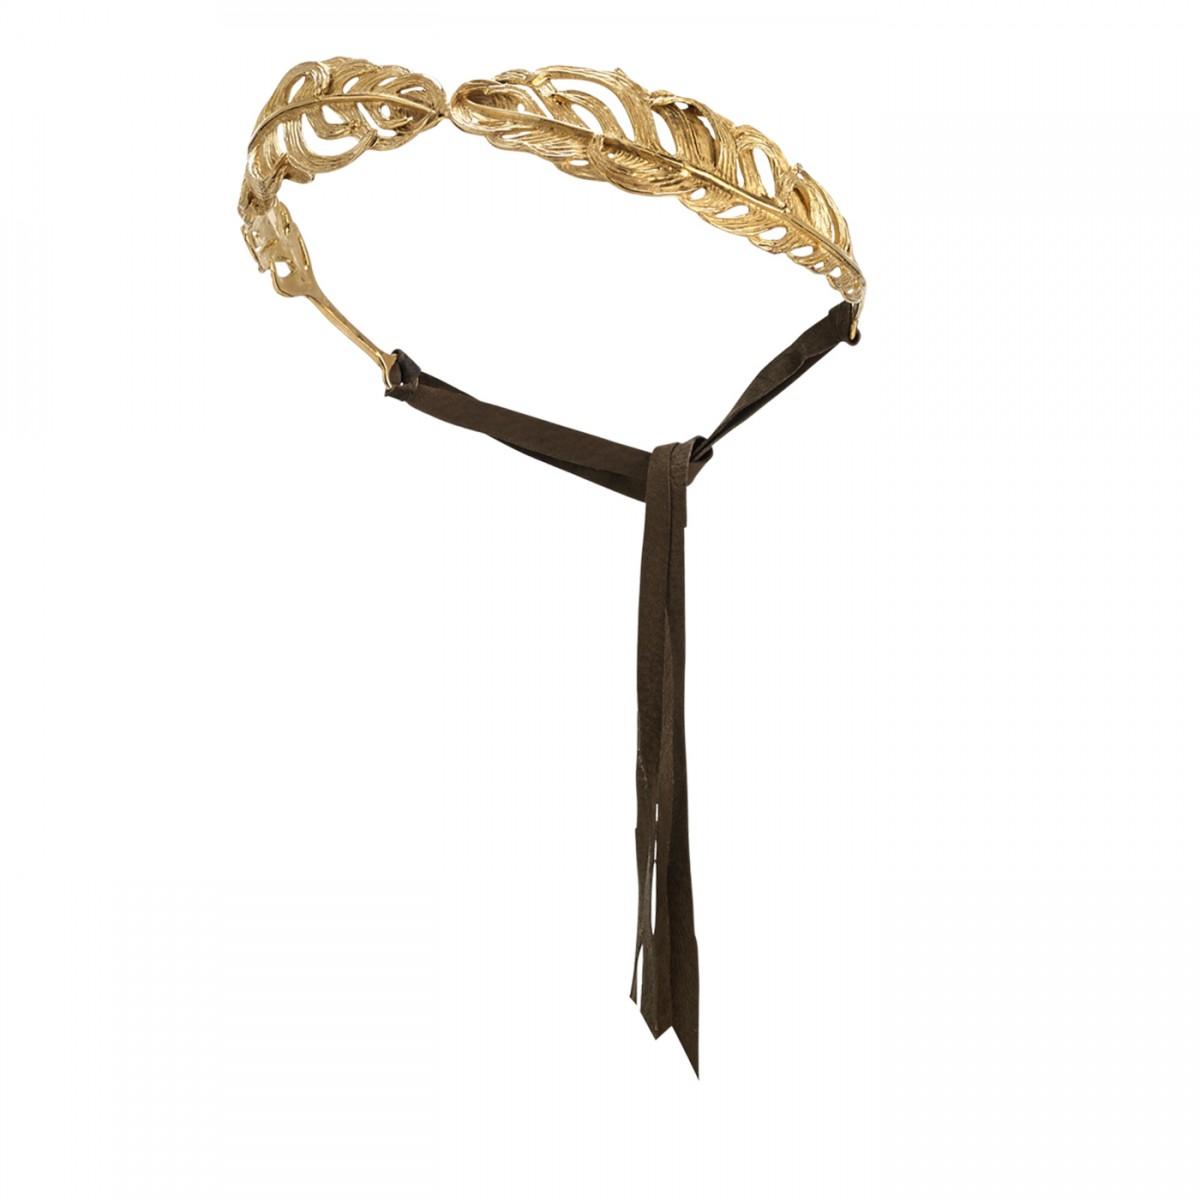 Madina Visconti – Feather Headband – Available on www.artemest.com